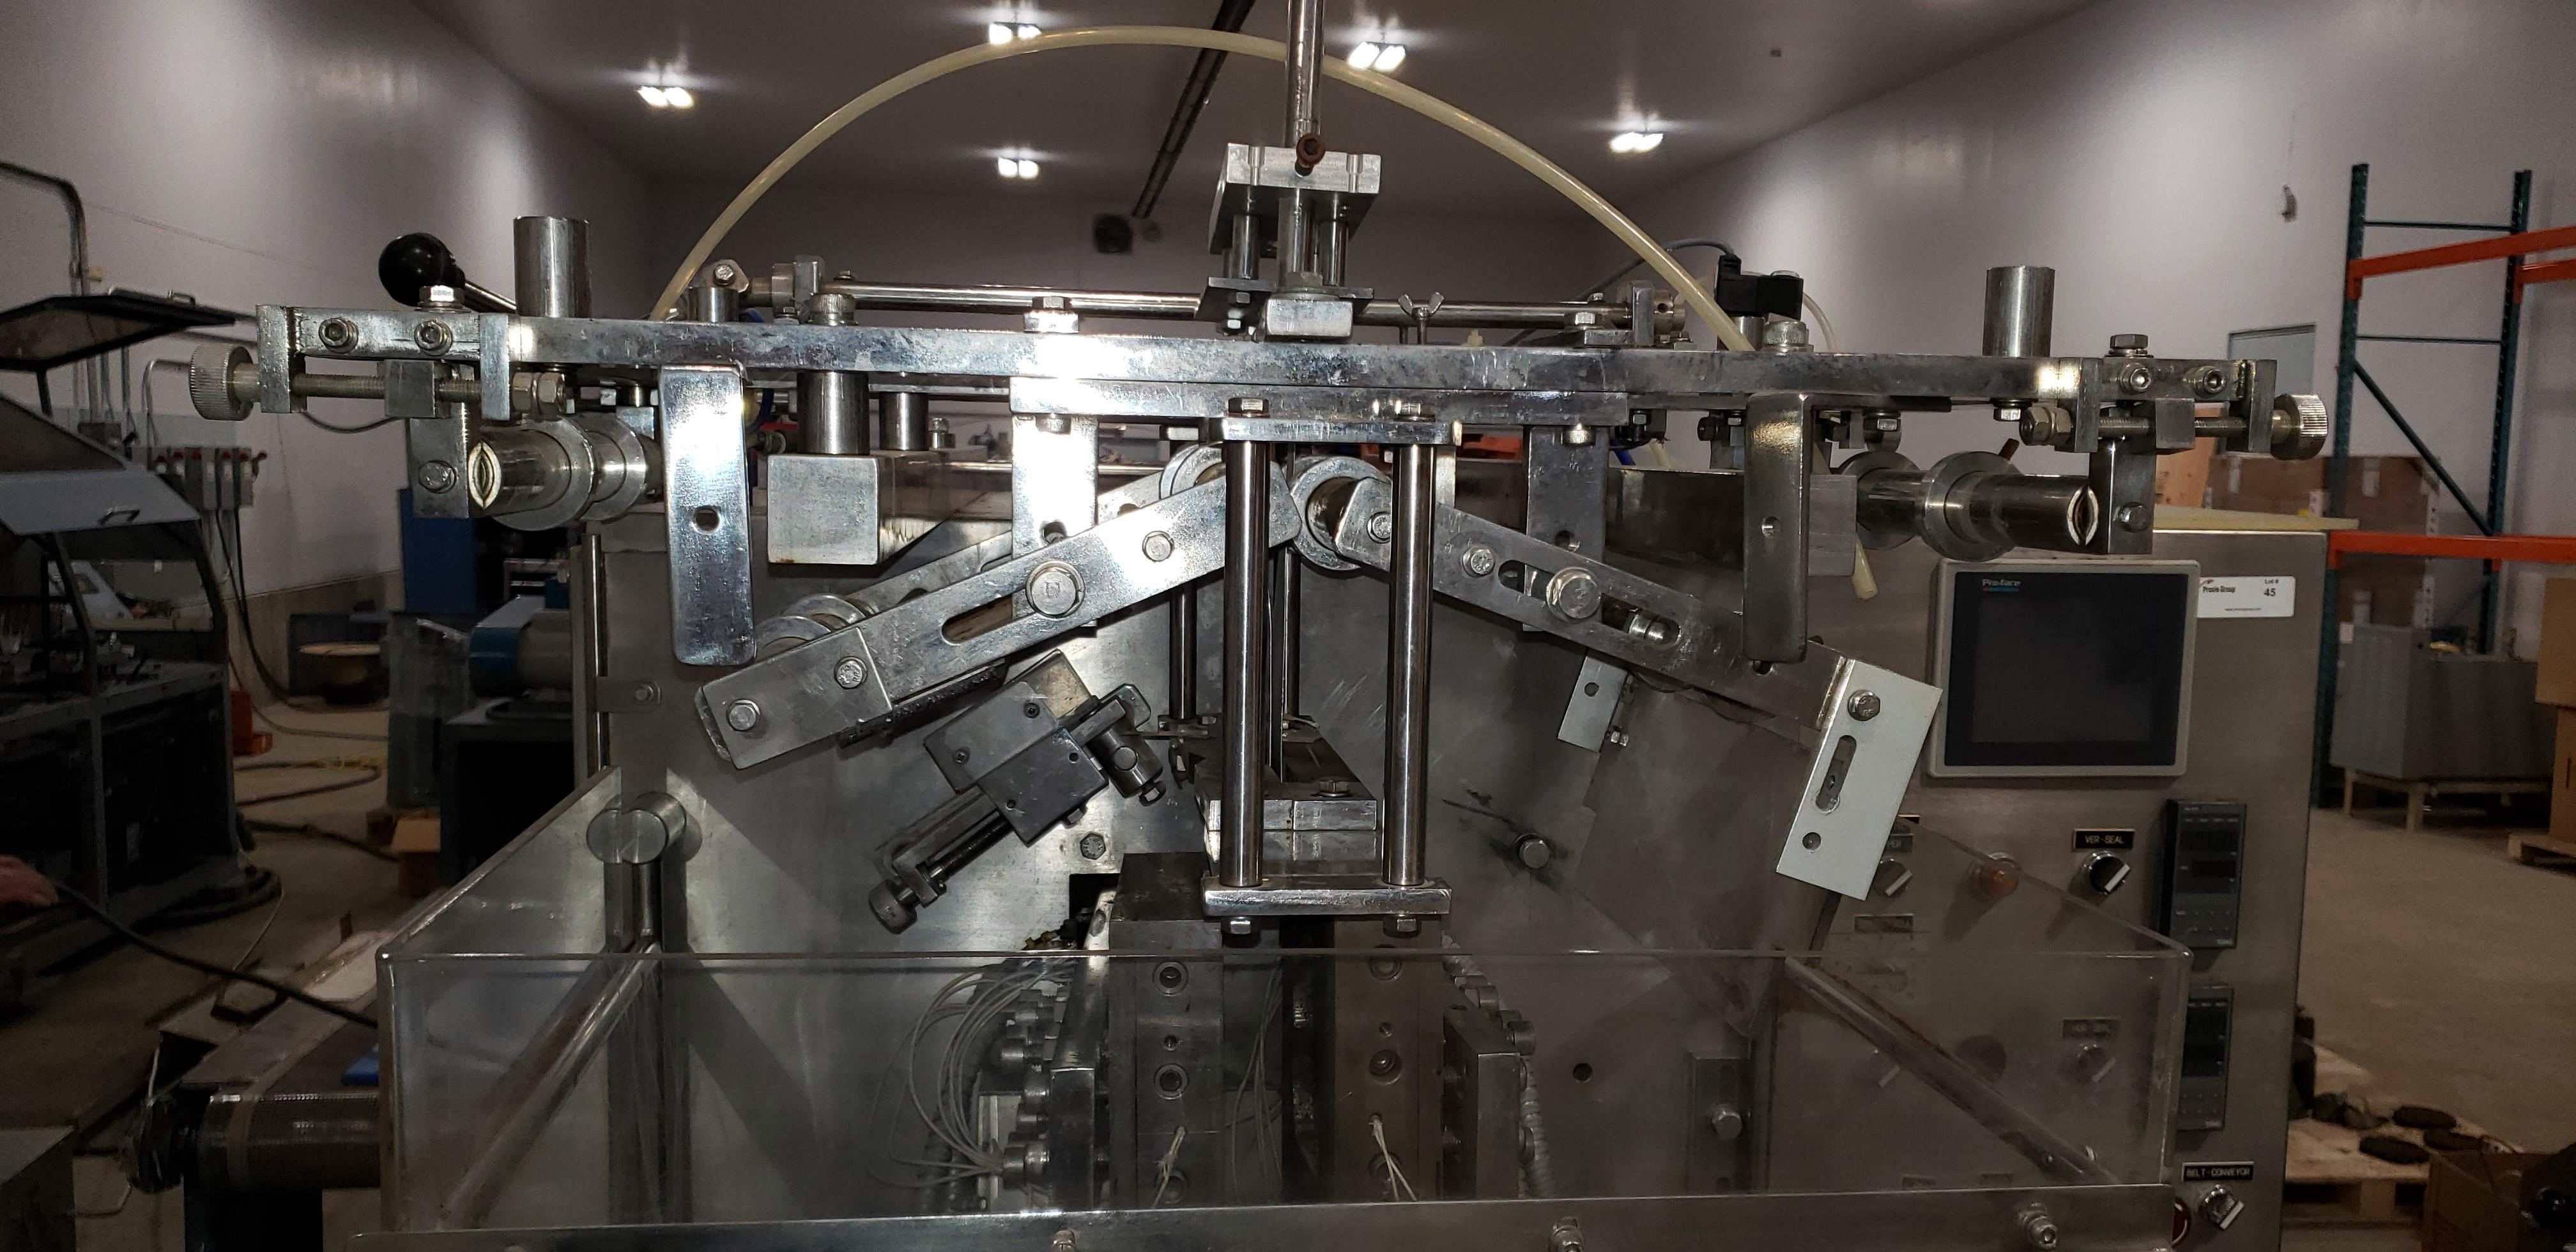 SAVPAK VERTICAL FORM FILL & SEAL MACHINE - Image 7 of 22